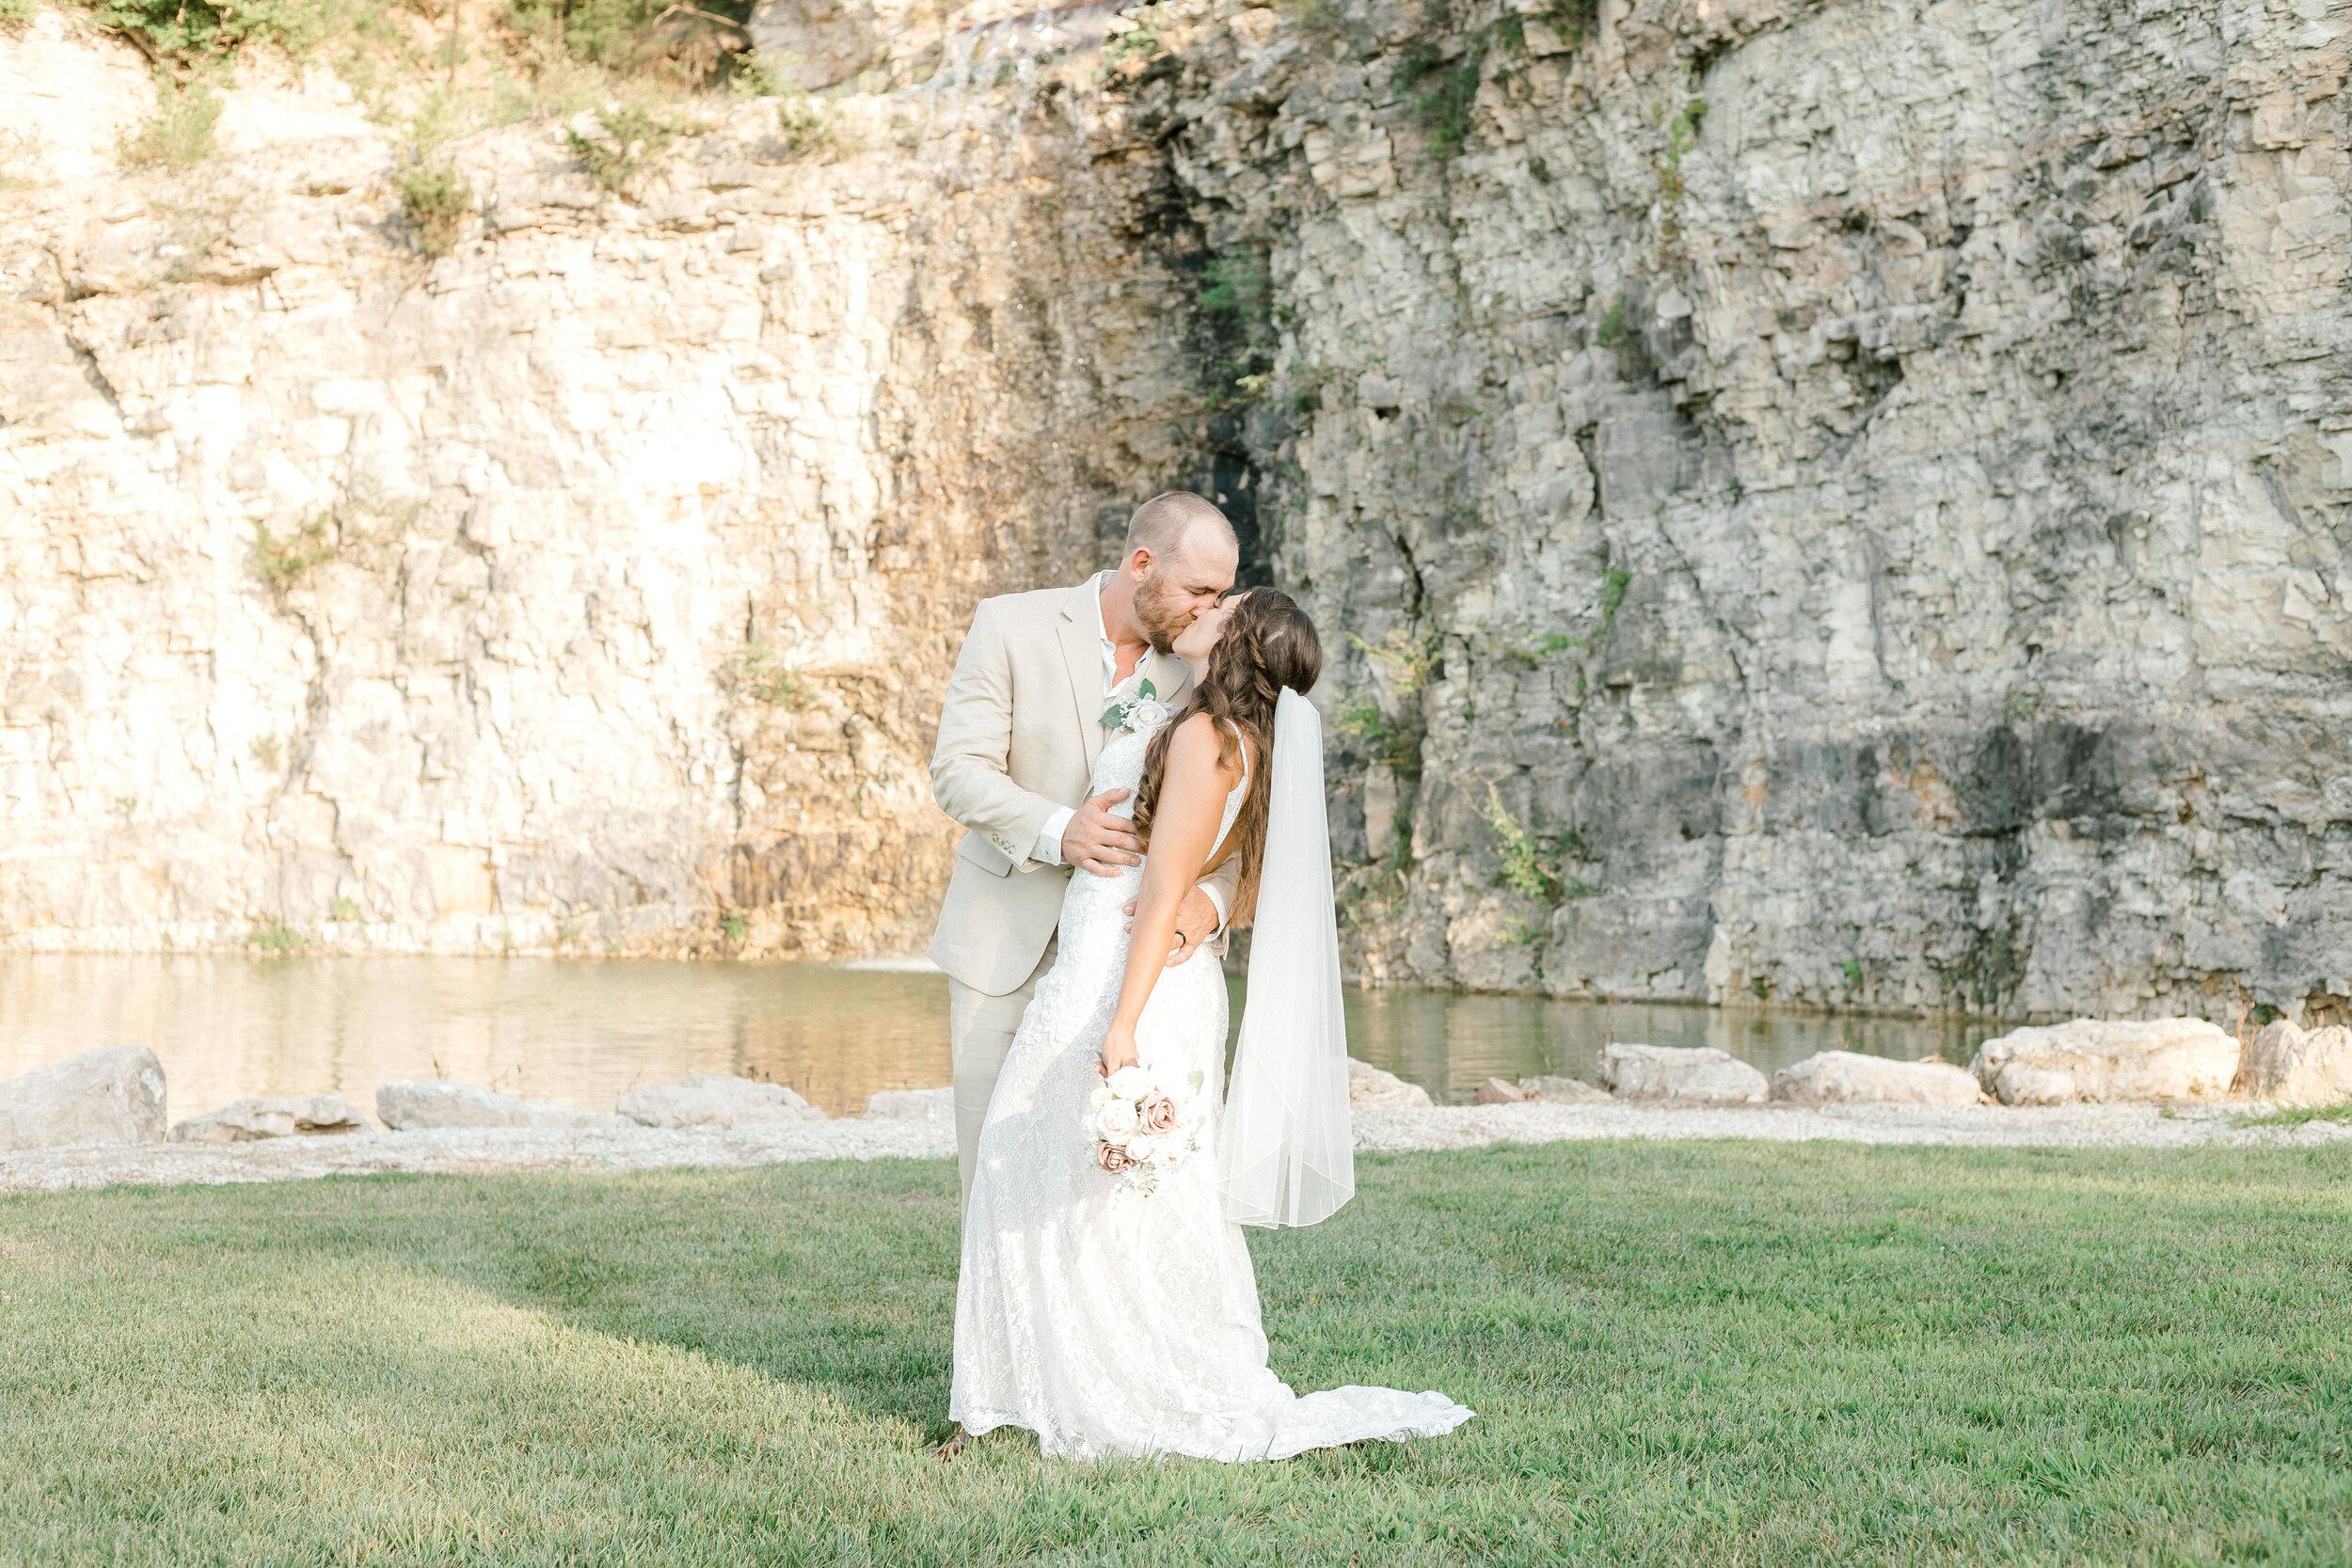 081019_Wedding_Laura_Bobby (320 of 506).jpg